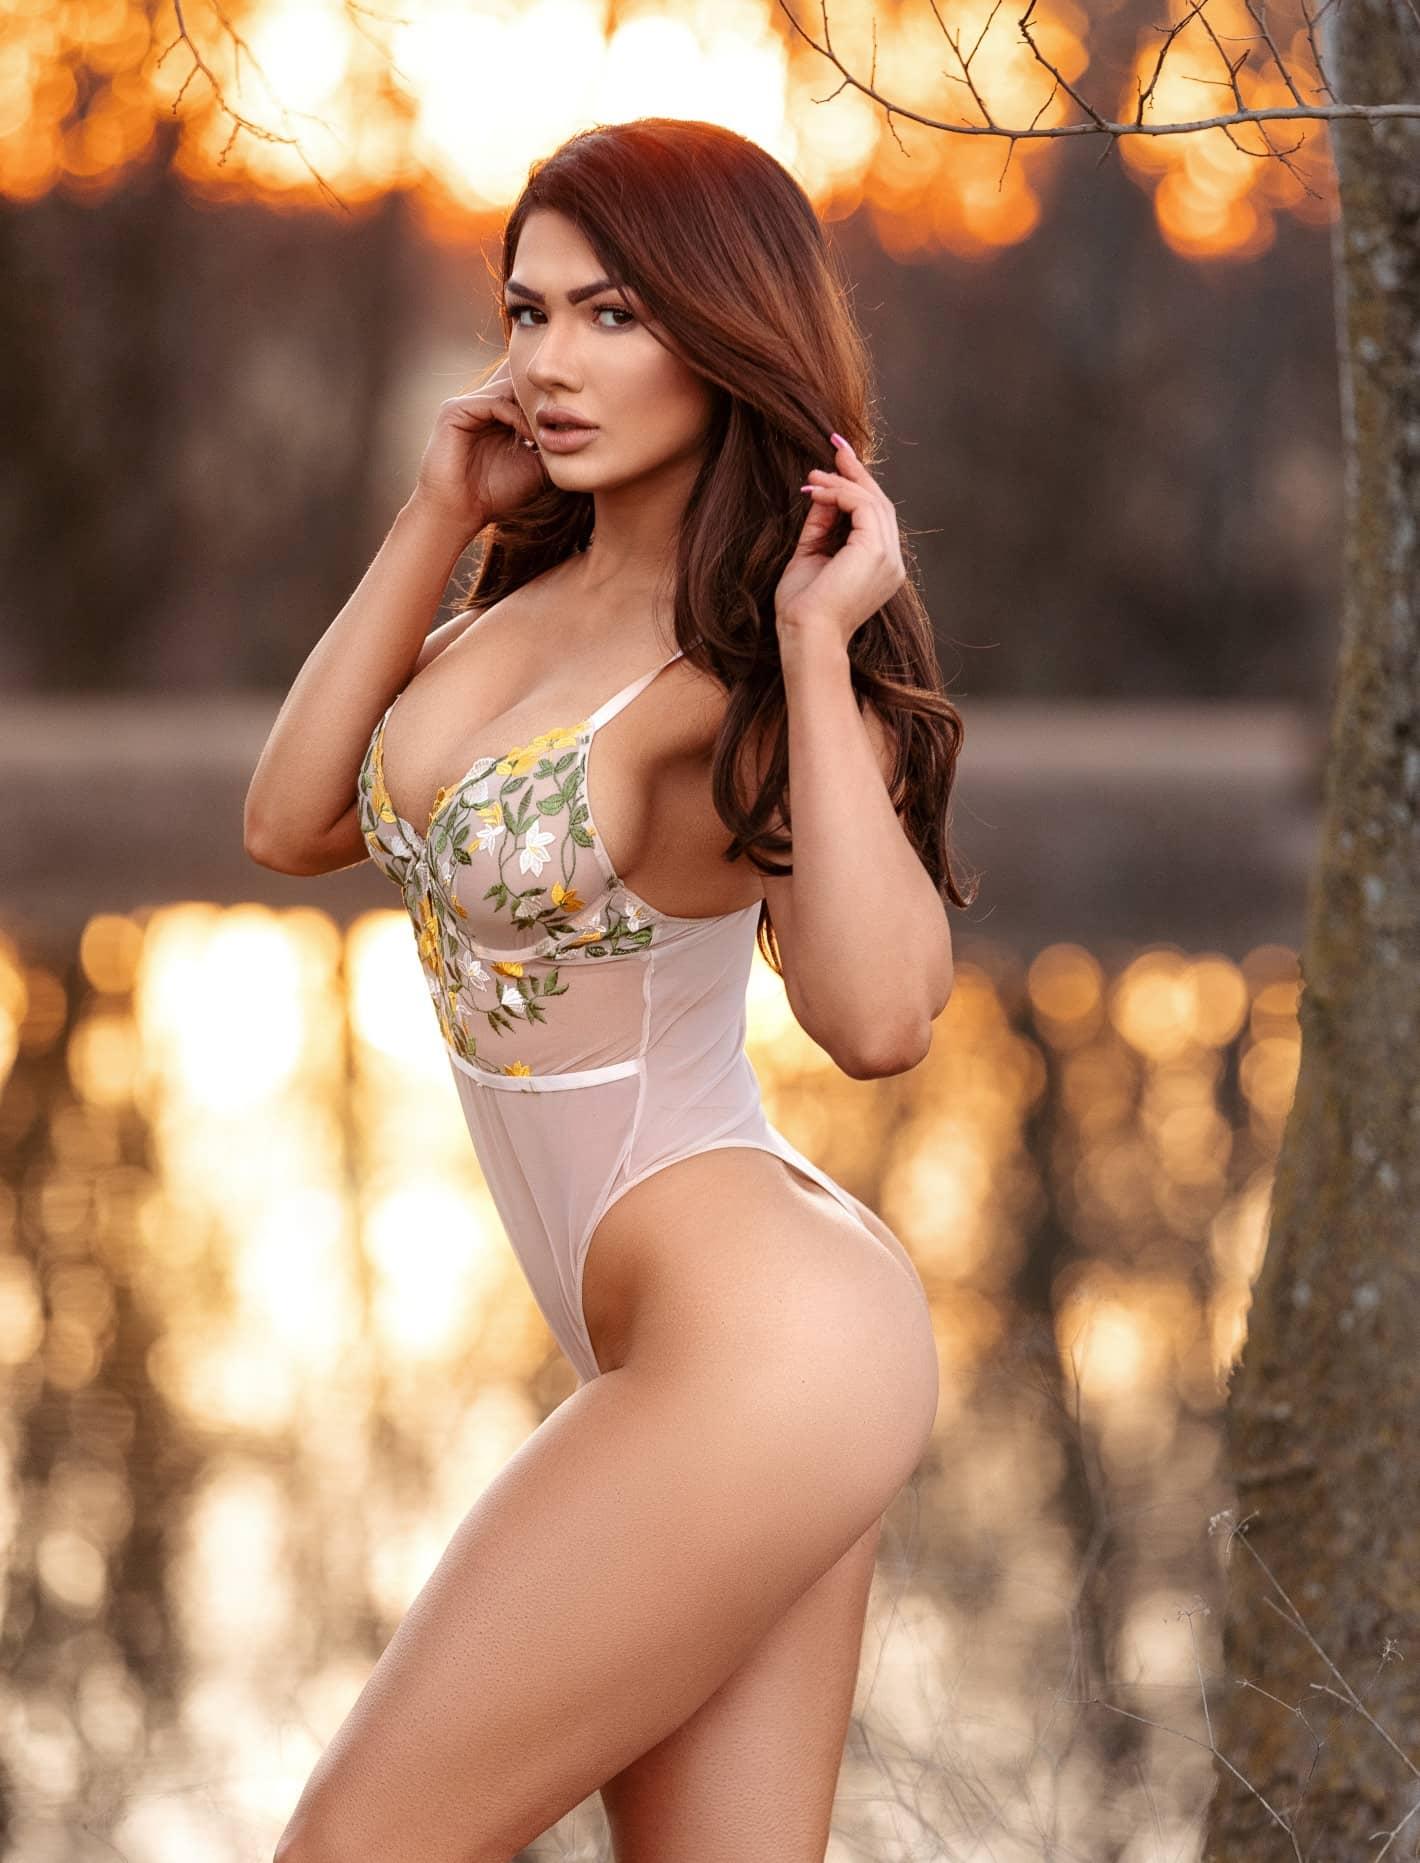 Melanie SAN ROMAN